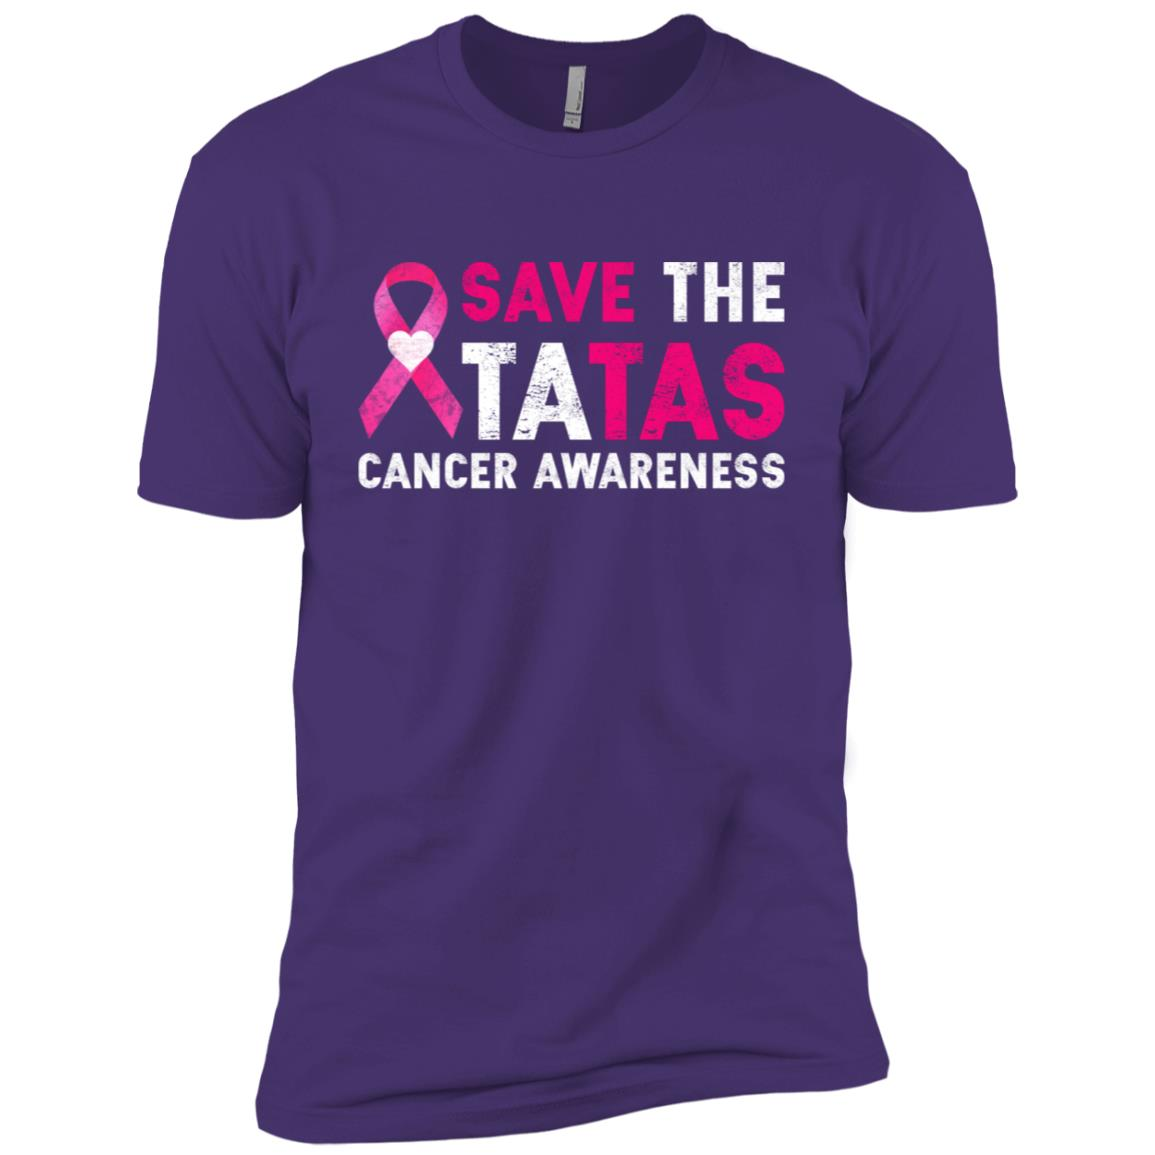 Save The Tatas – Save The Tatas For Men Women Men Short Sleeve T-Shirt